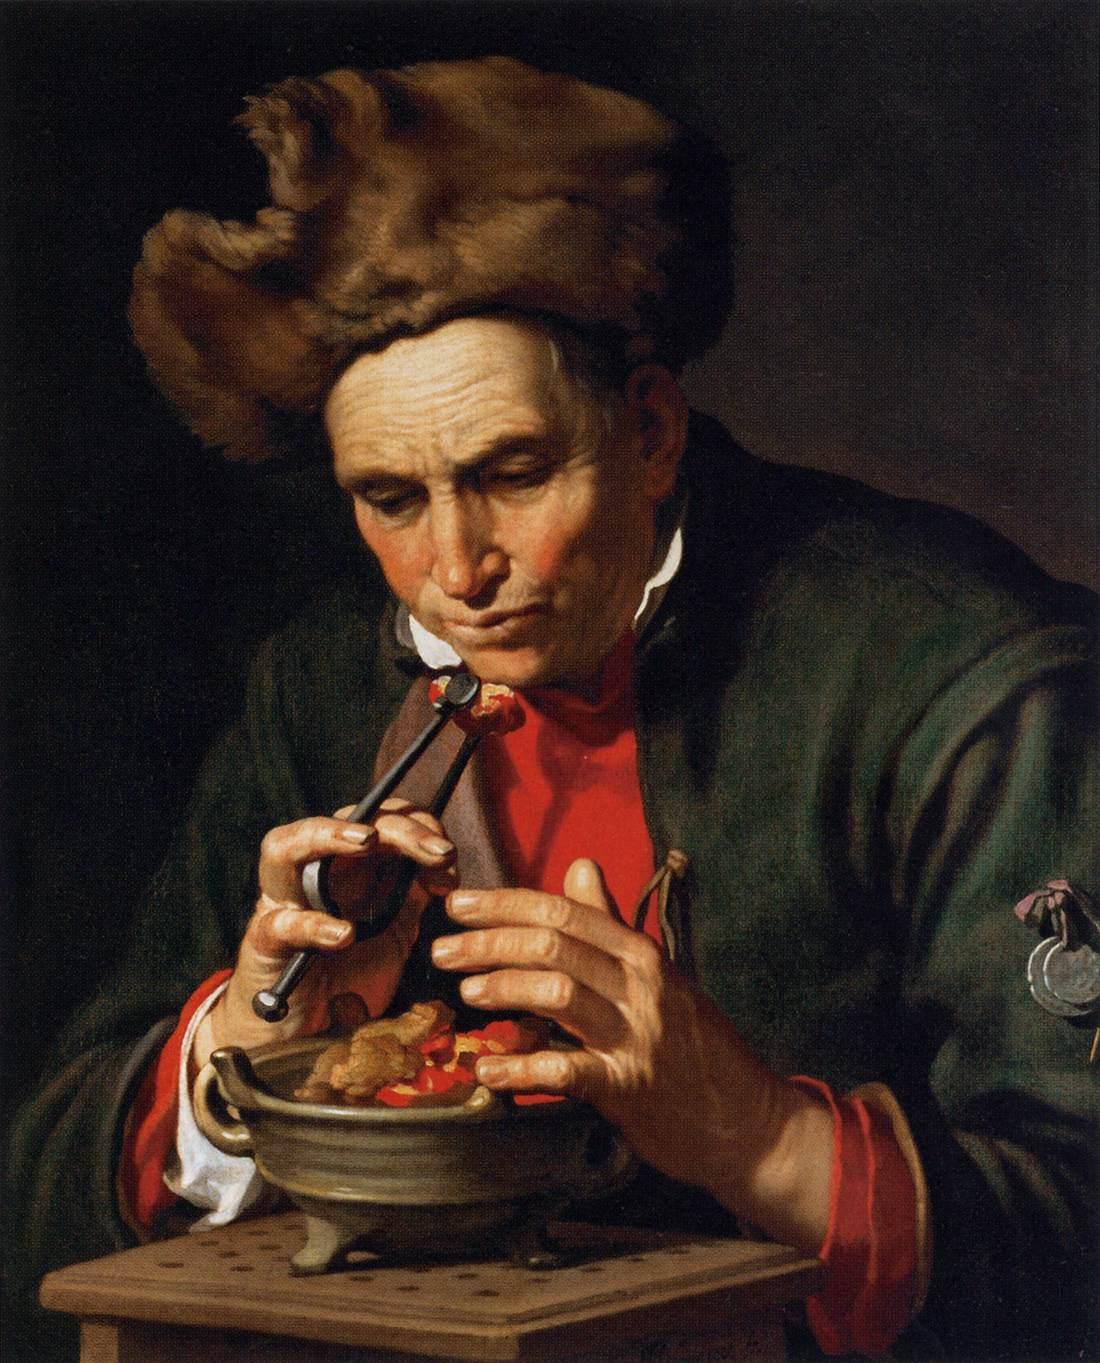 http://www.wga.hu/art/b/bloemaer/abraham/allegory.jpg